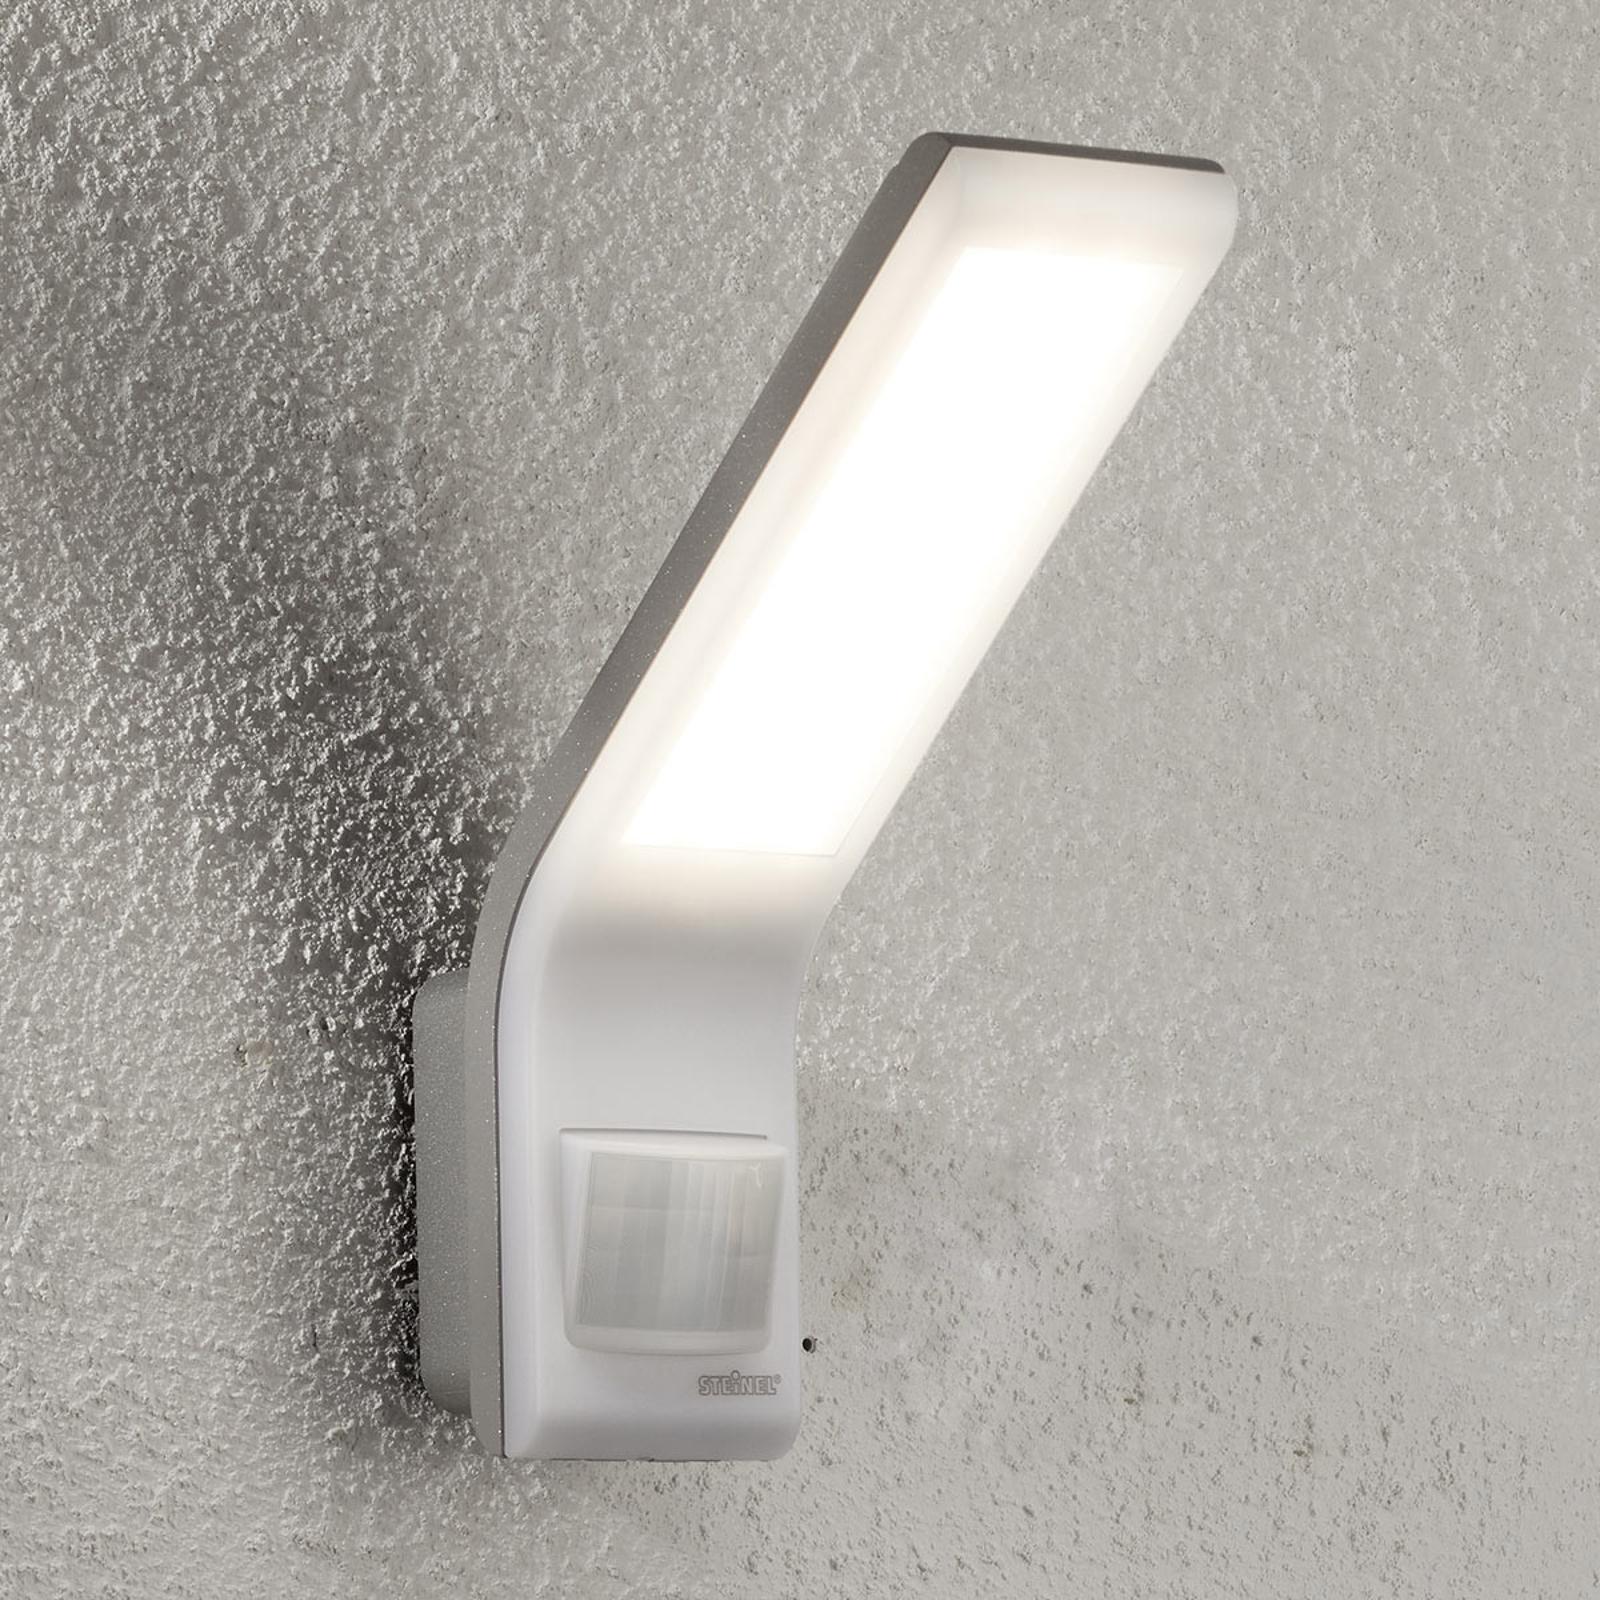 Tyylikäs LED-seinävalaisin XLED slim